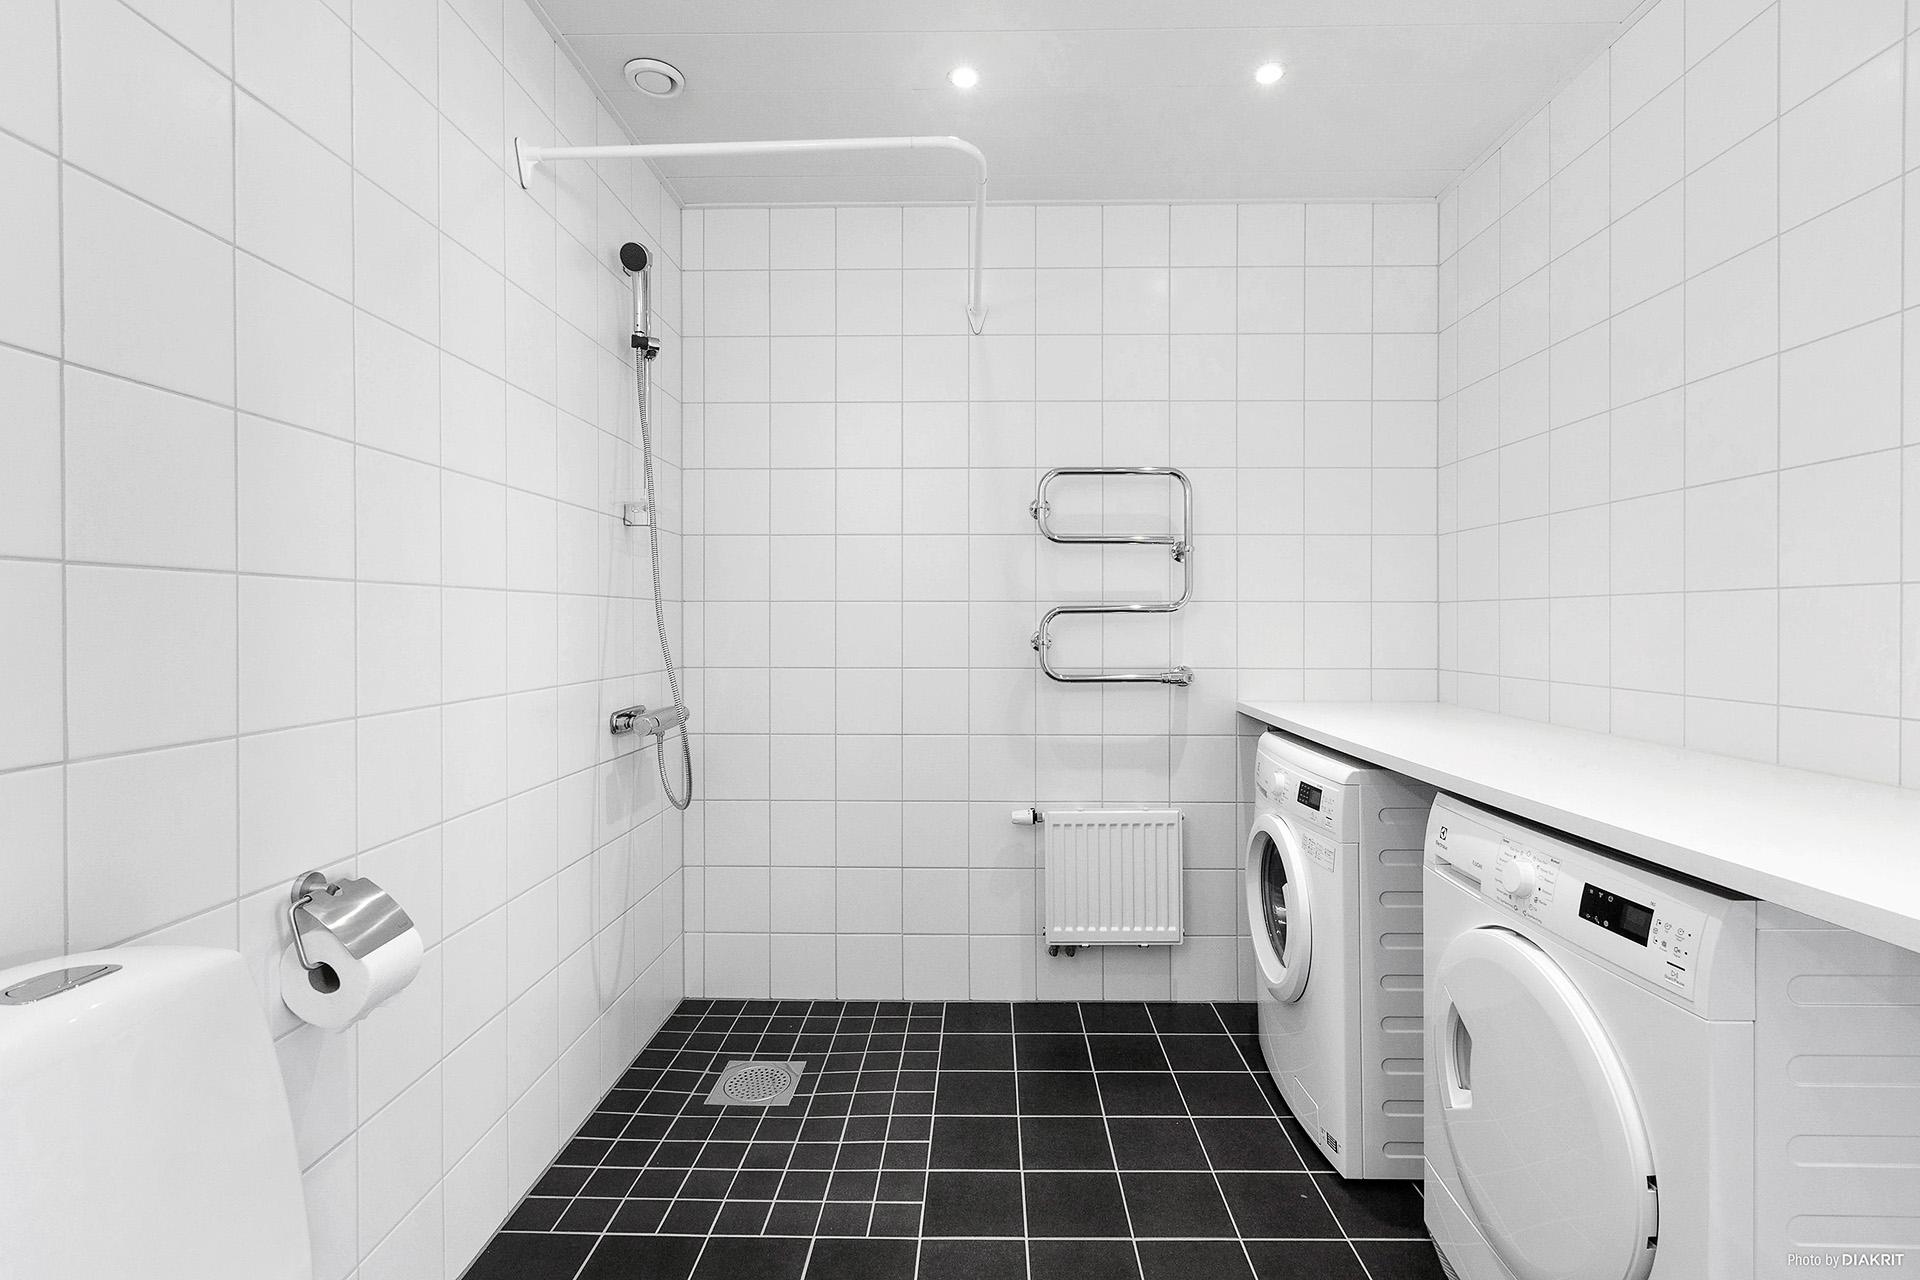 Tvättstuga/duschrum